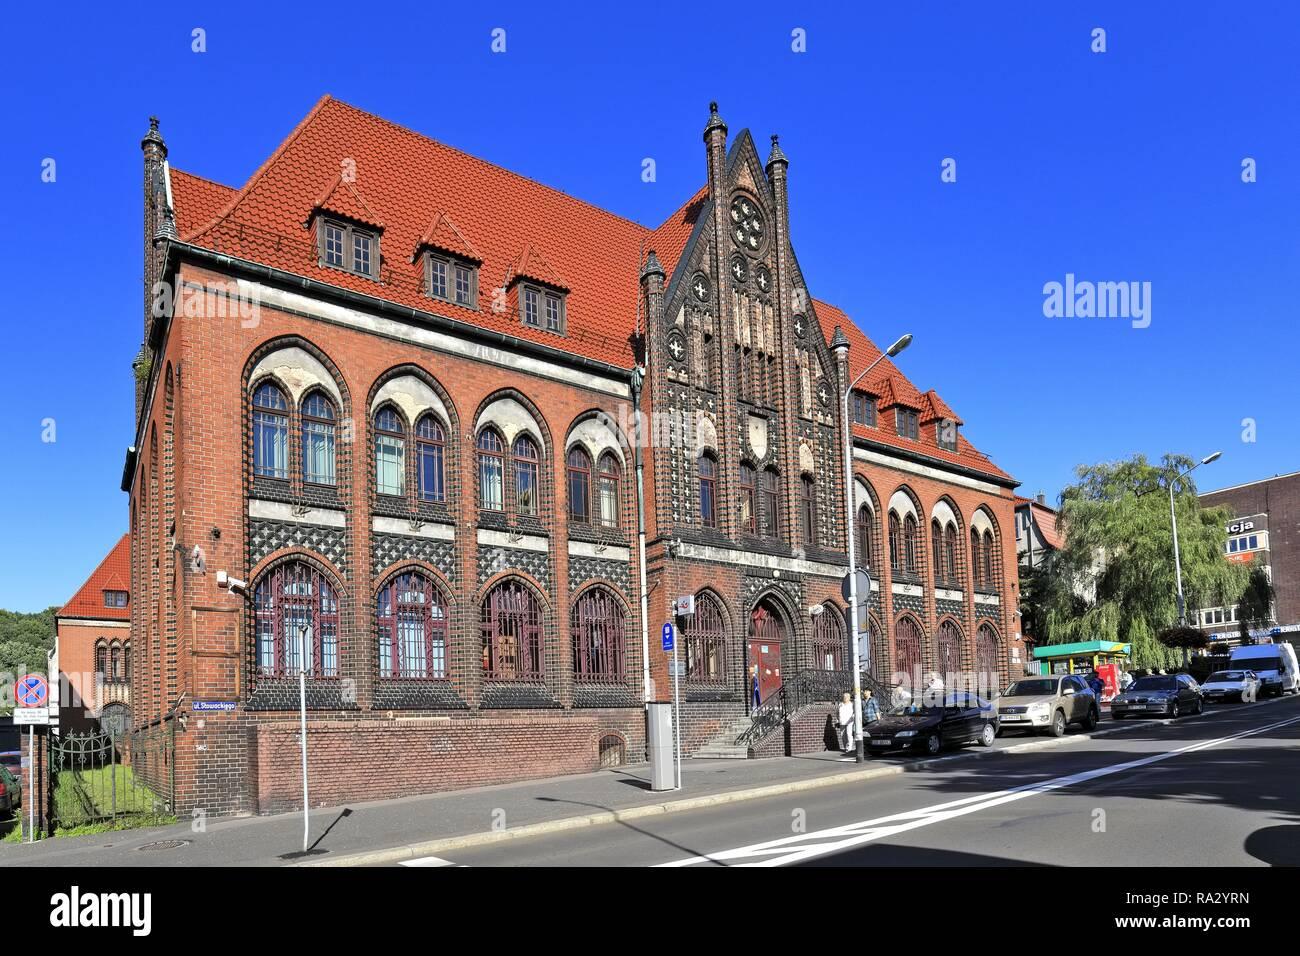 Poland , Lower Silesia , Walbrzych , Historical Post Office building by the Slowackiego street - Stock Image